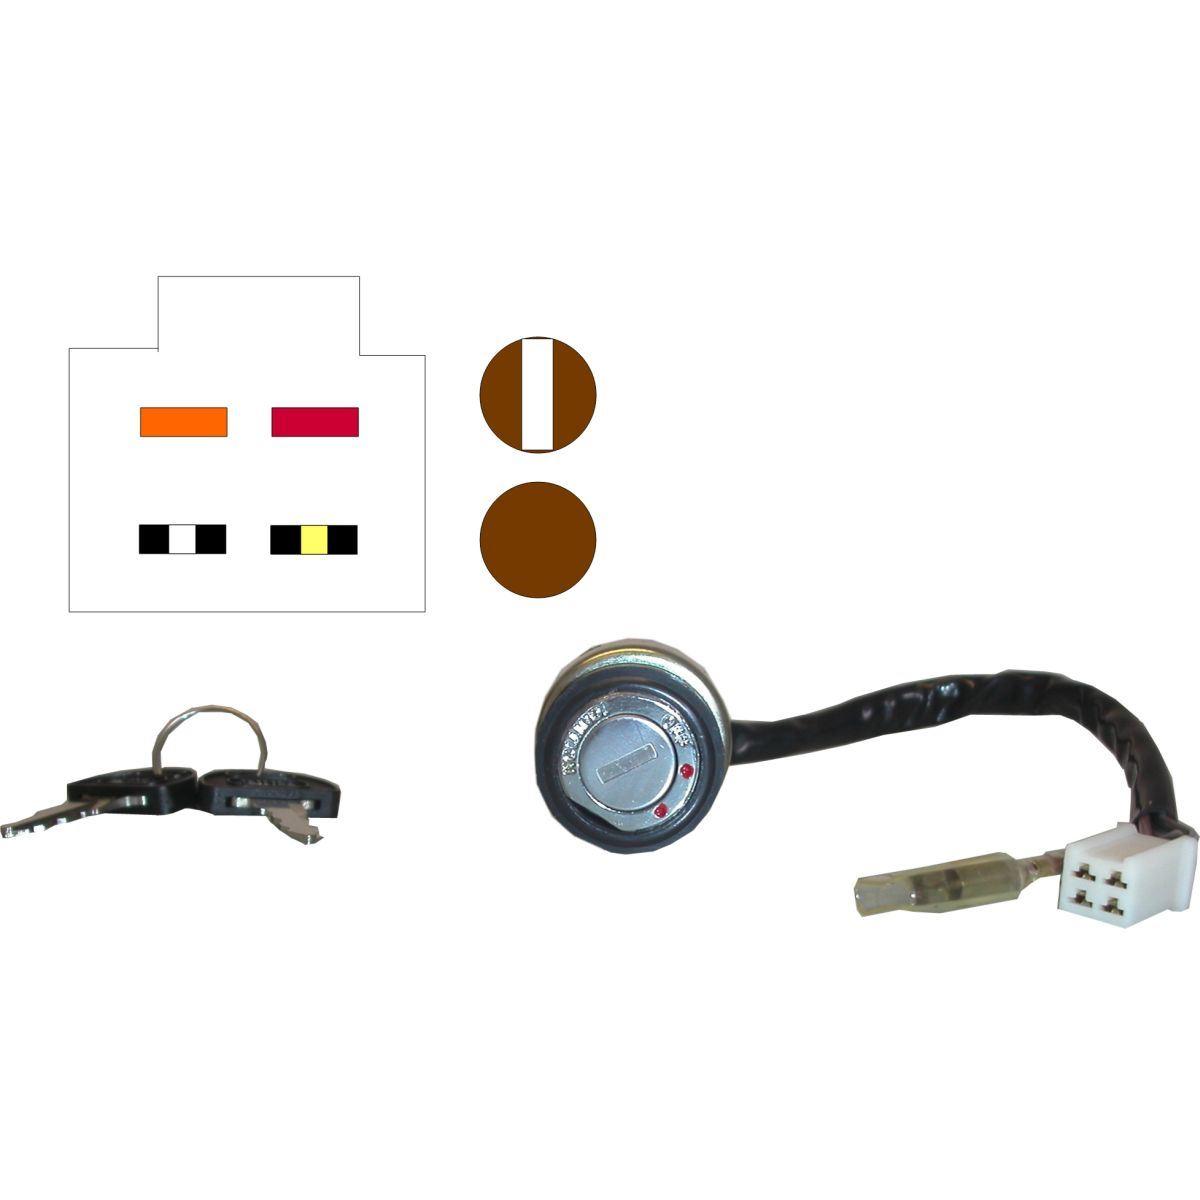 hight resolution of picture of ignition switch suzuki gp100 x7 6 wires